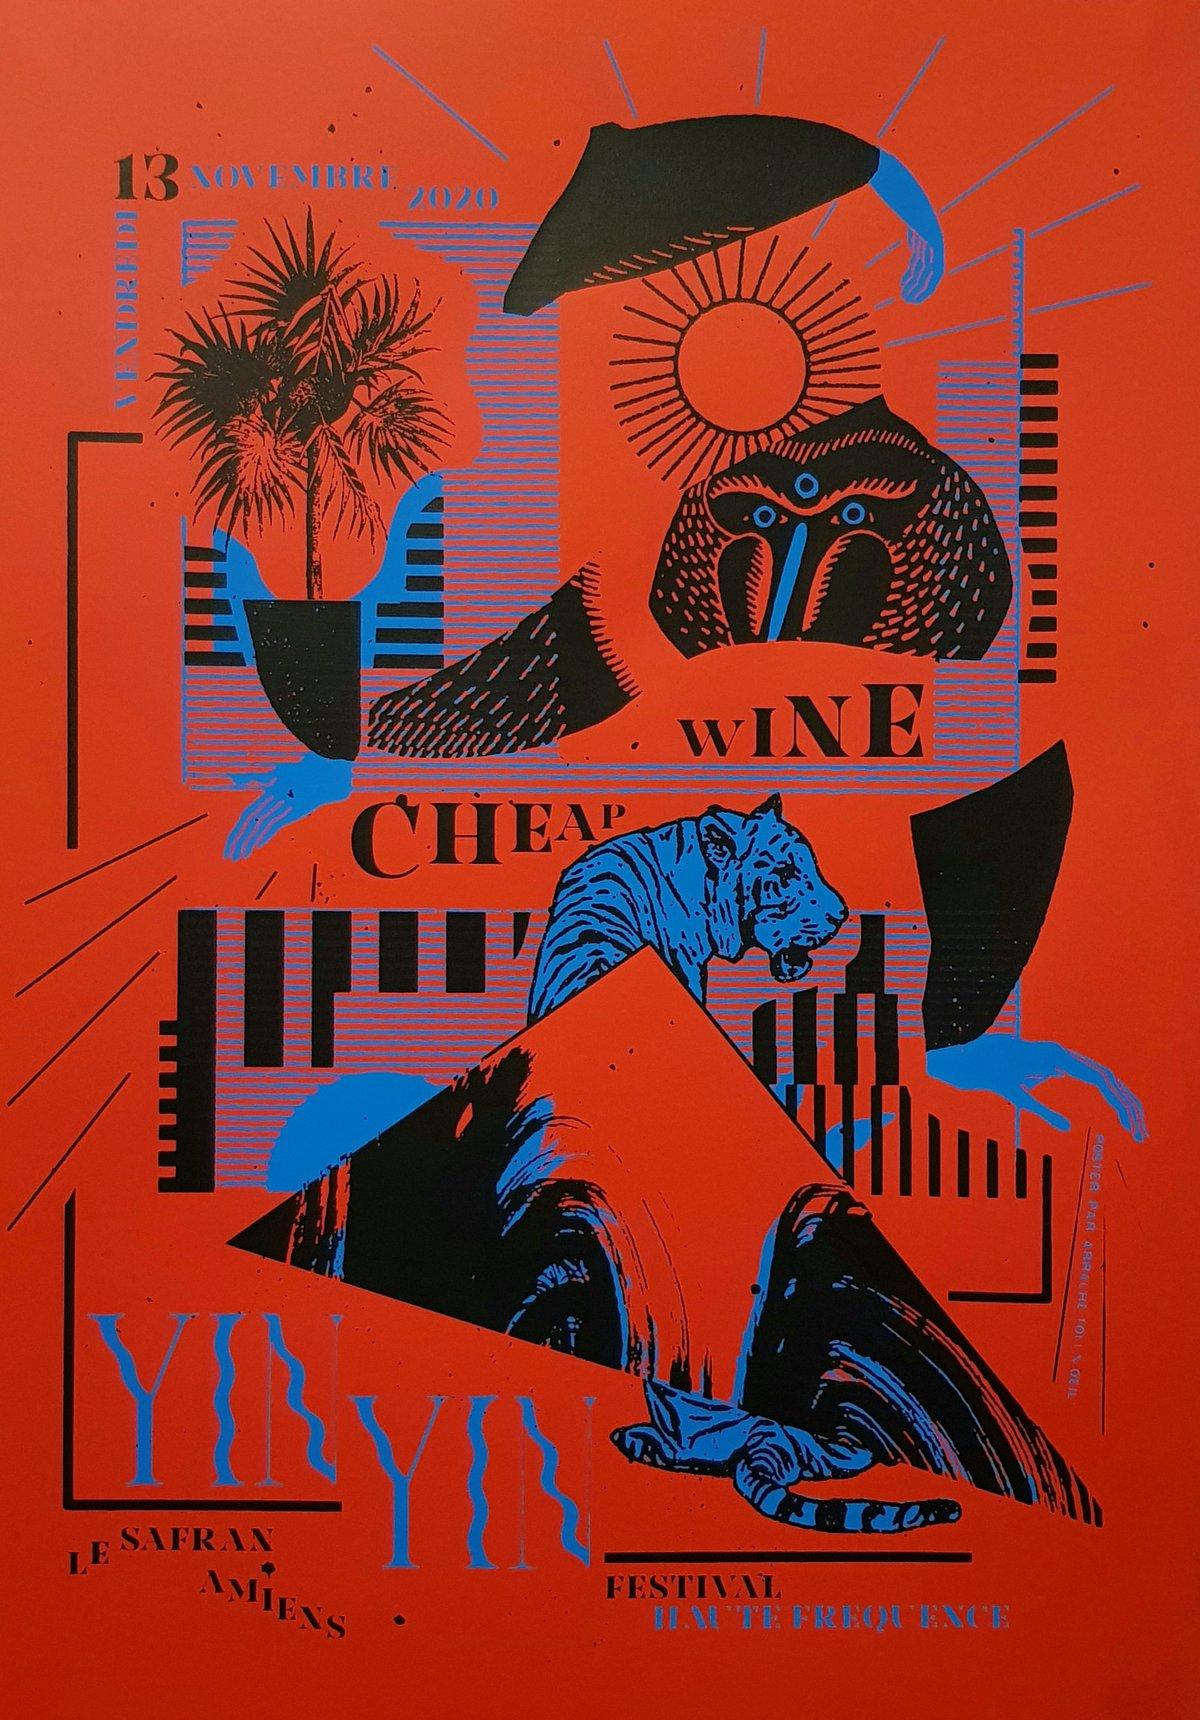 YIN YIN / CHEAP WINE (gigposter Amiens) 2020